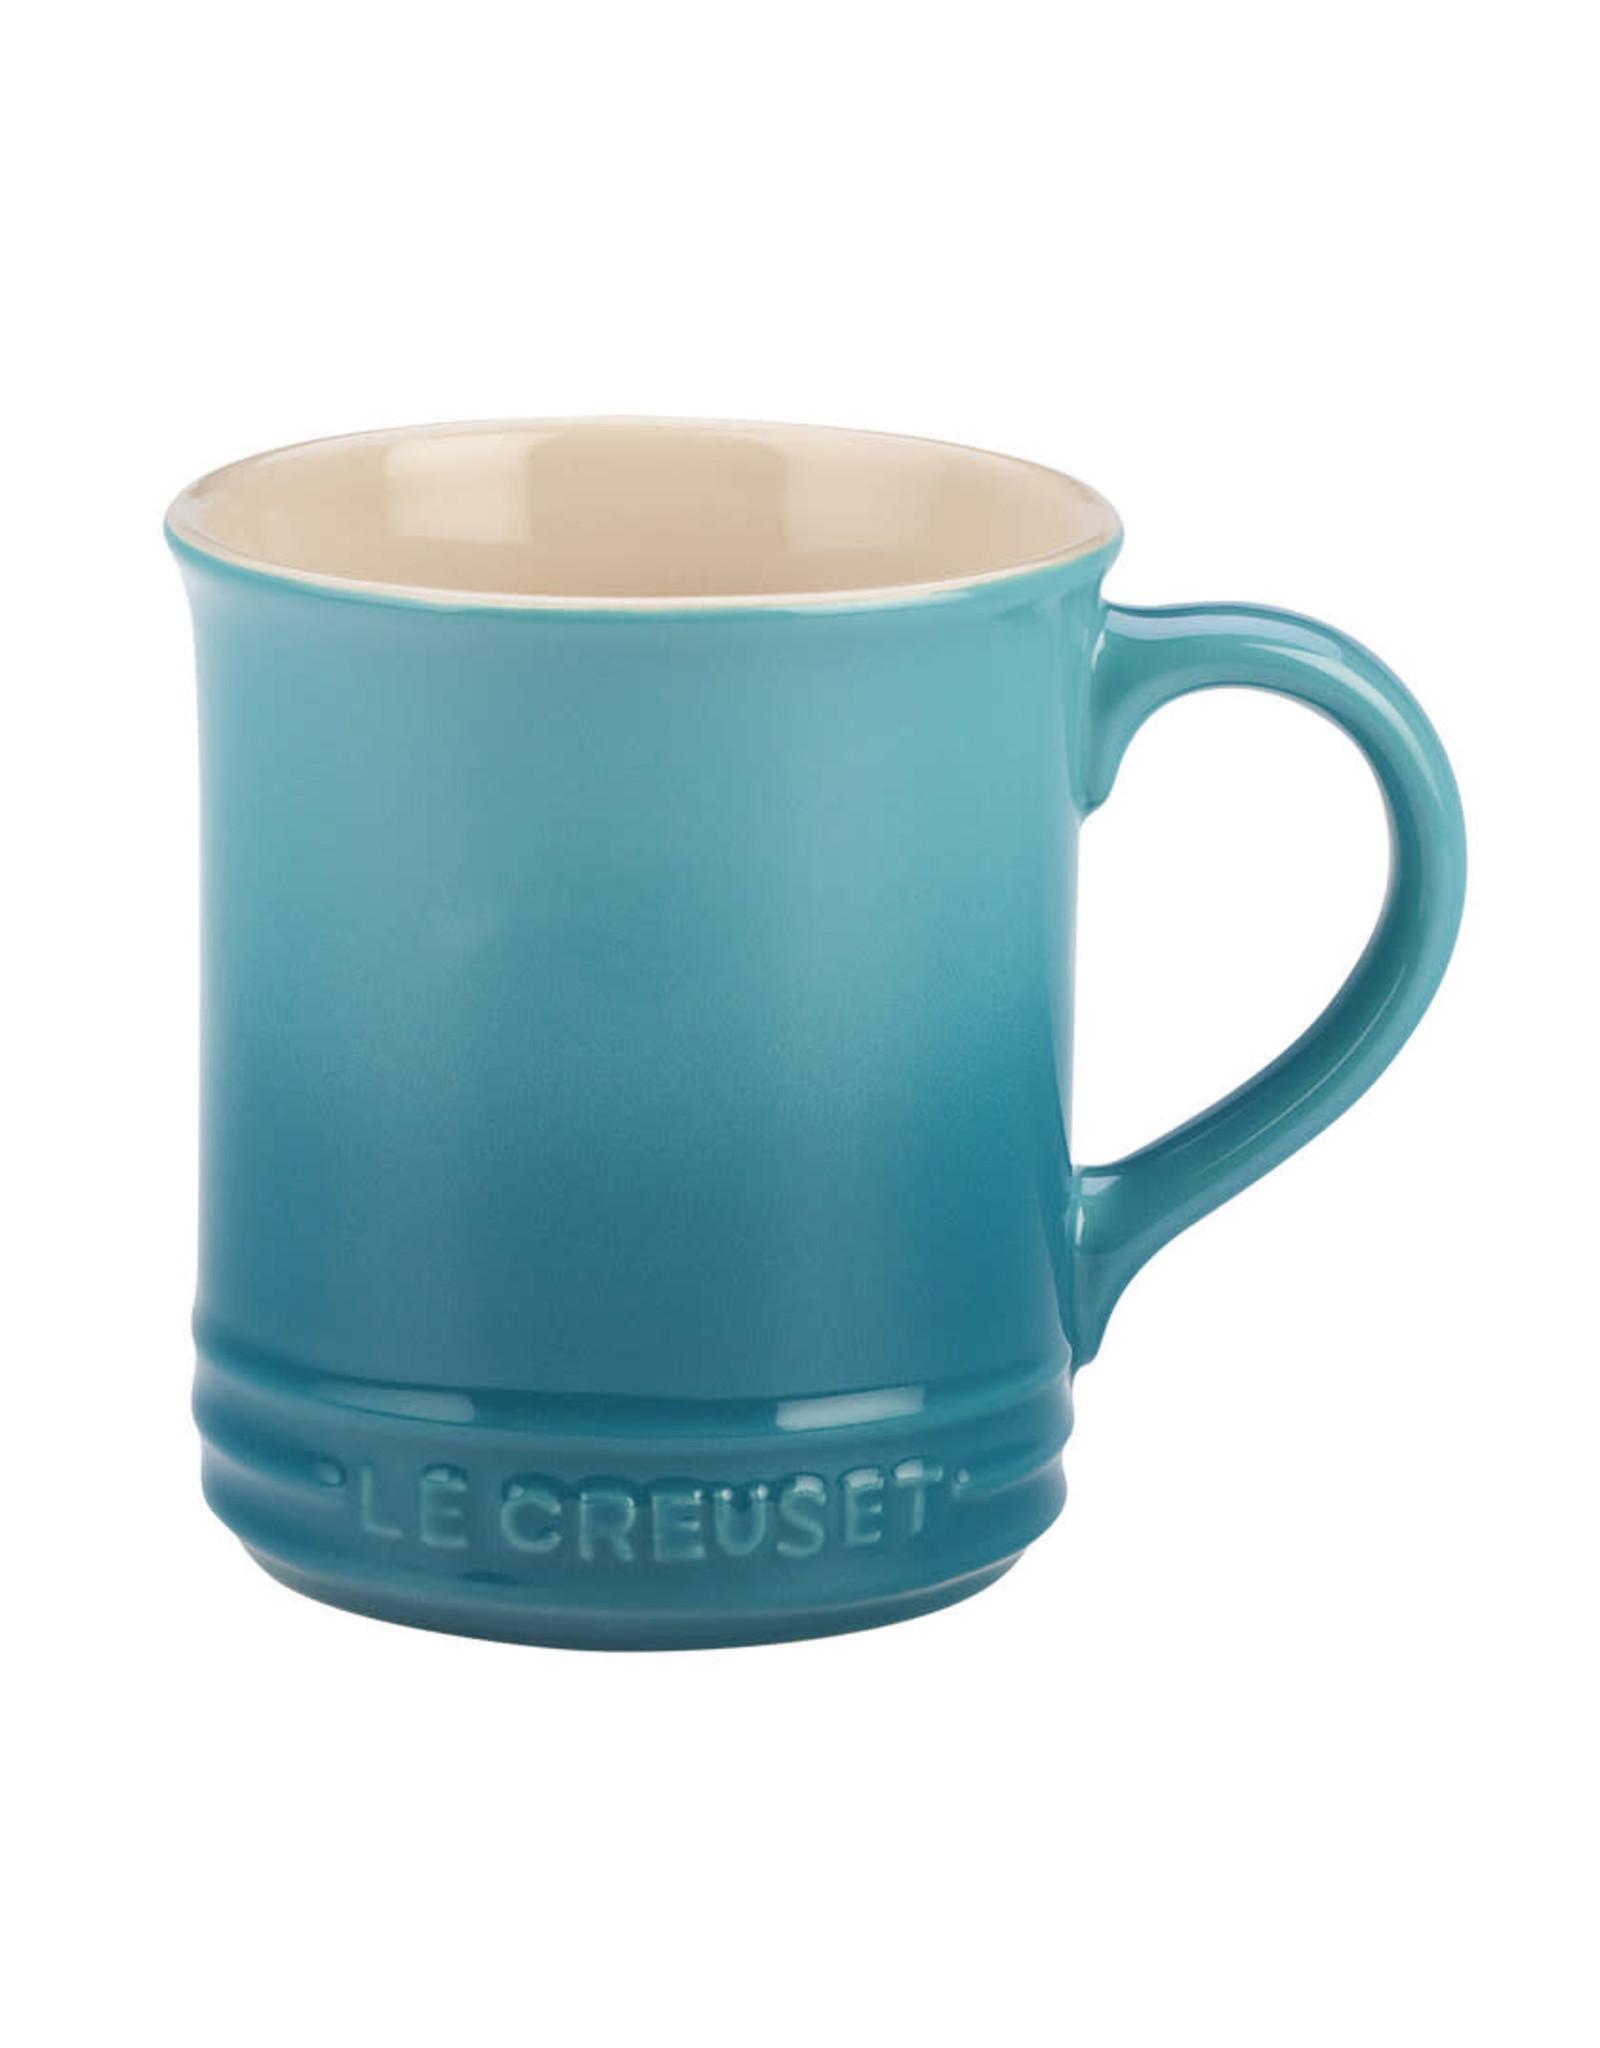 Le Creuset LE CREUSET-14oz Chicago Mug - Caribbean